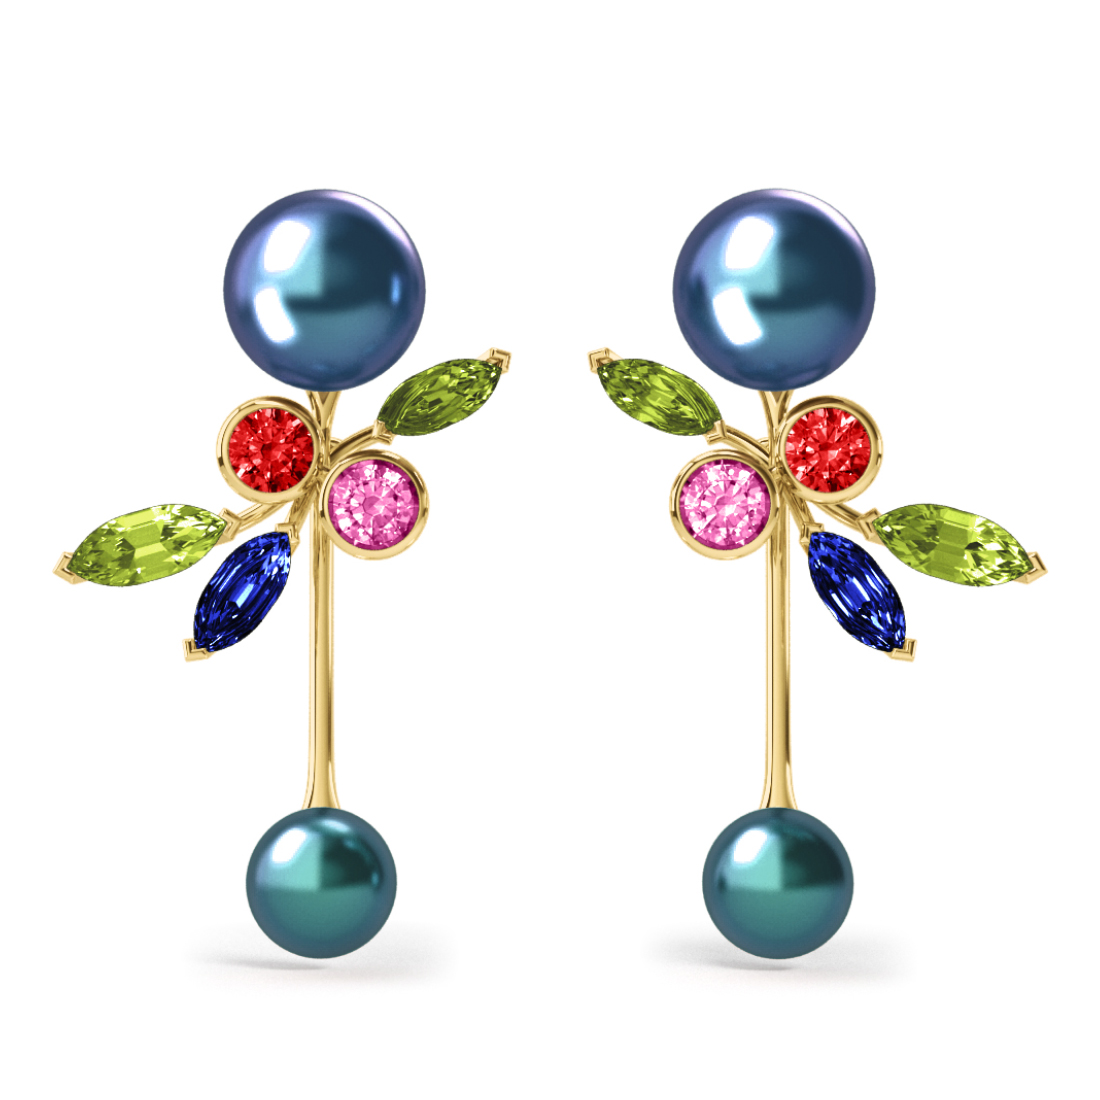 Boucles d'oreilles Pearly Angel Peacock & Céleste - Saphirs, diamants, peridots & perles de Tahiti <br /> Or jaune 18 carats